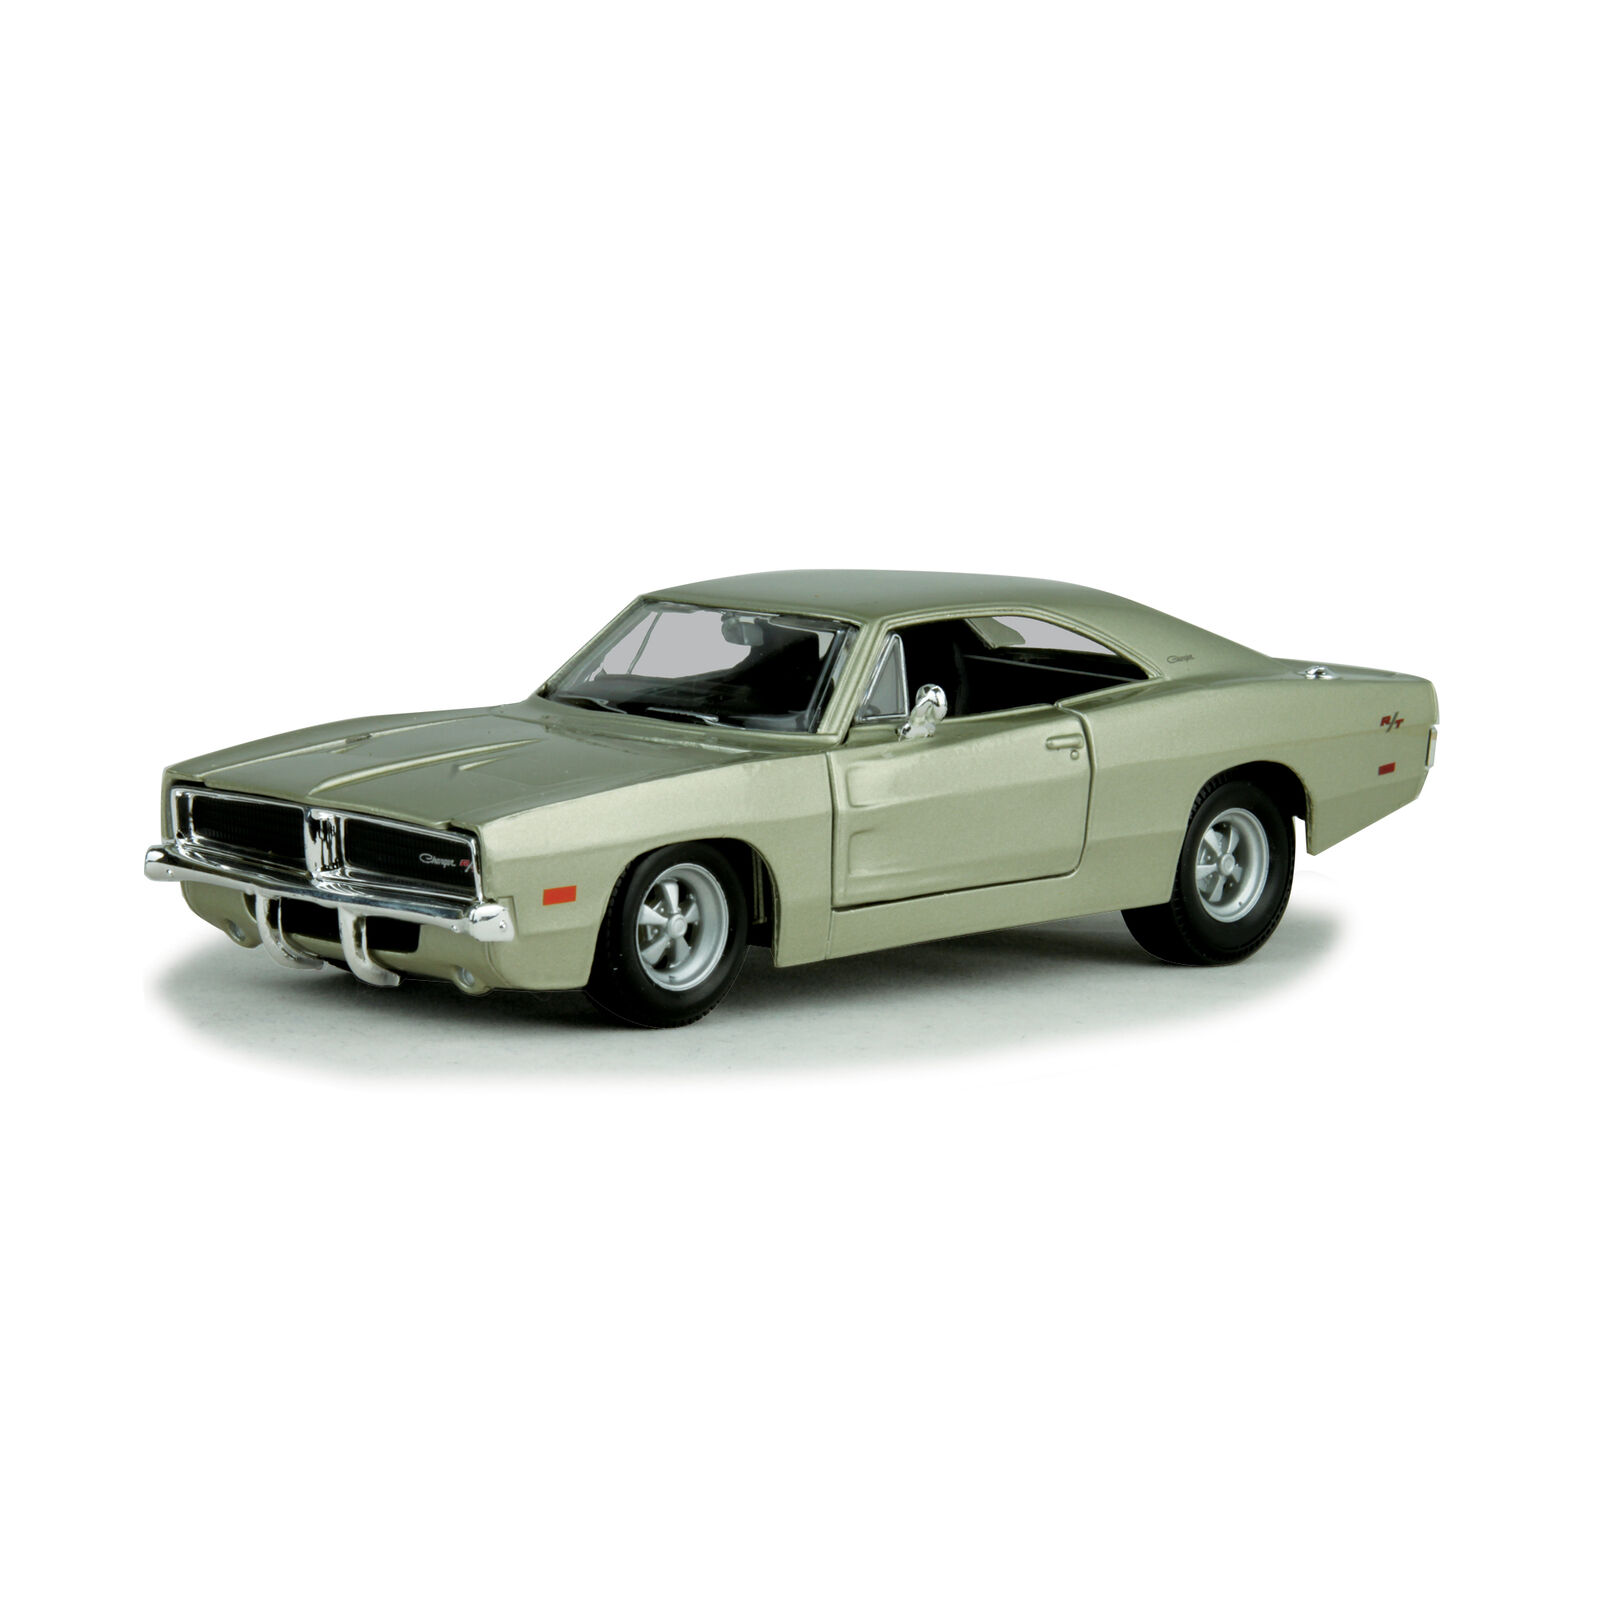 DODGE CHARGER R//T 1969 SILVER 1:25 AUTO STRADALI MAISTO SCALA 1:24 MODELS